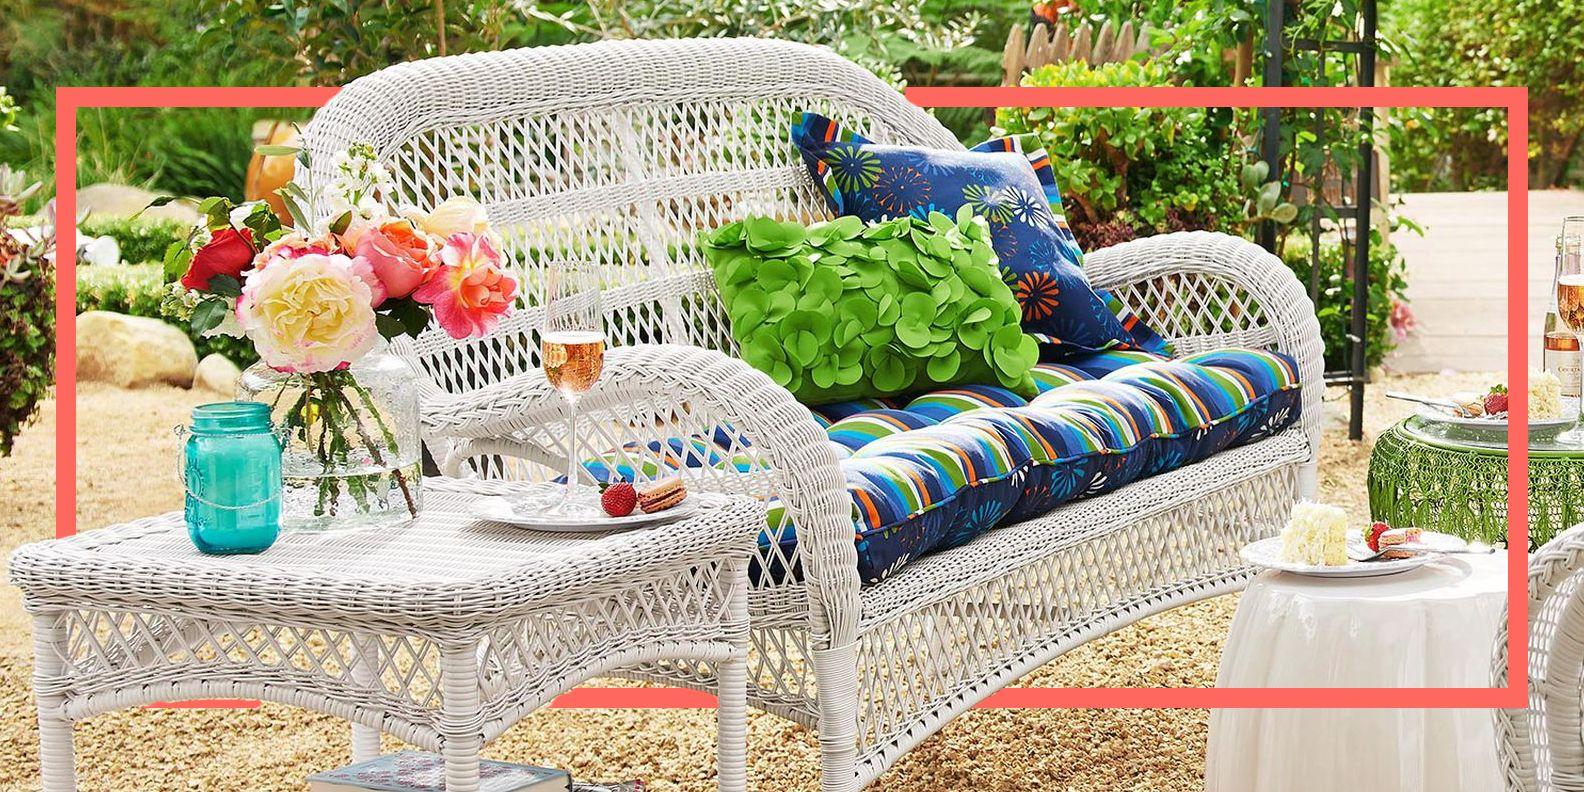 The Best Rattan Garden Furniture for Your Outdoor Patio - Wicker